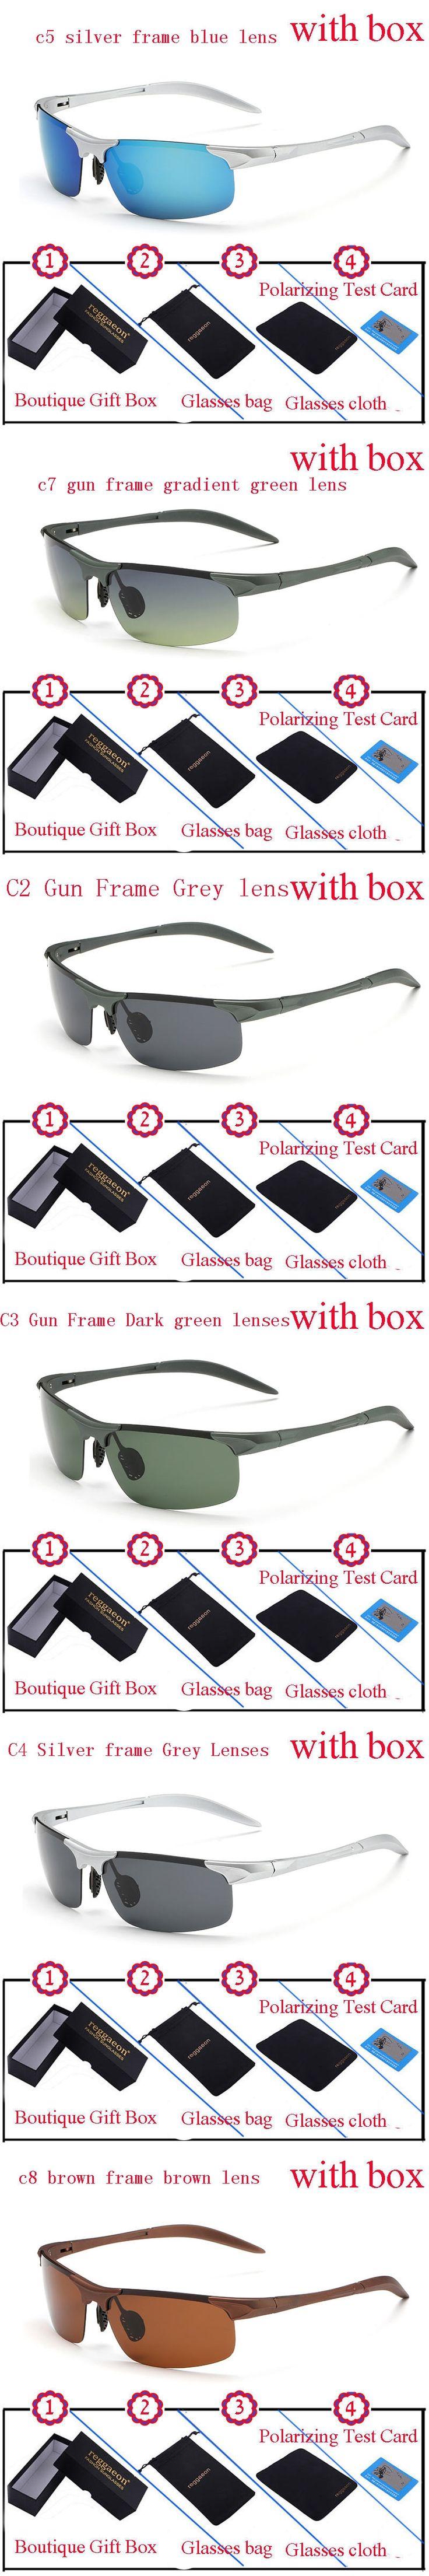 Luxury Reggaeon brand Design polarized men  goggles hot driving sunglasses Sports Coating Male Eyewear Accessories Color Lenses